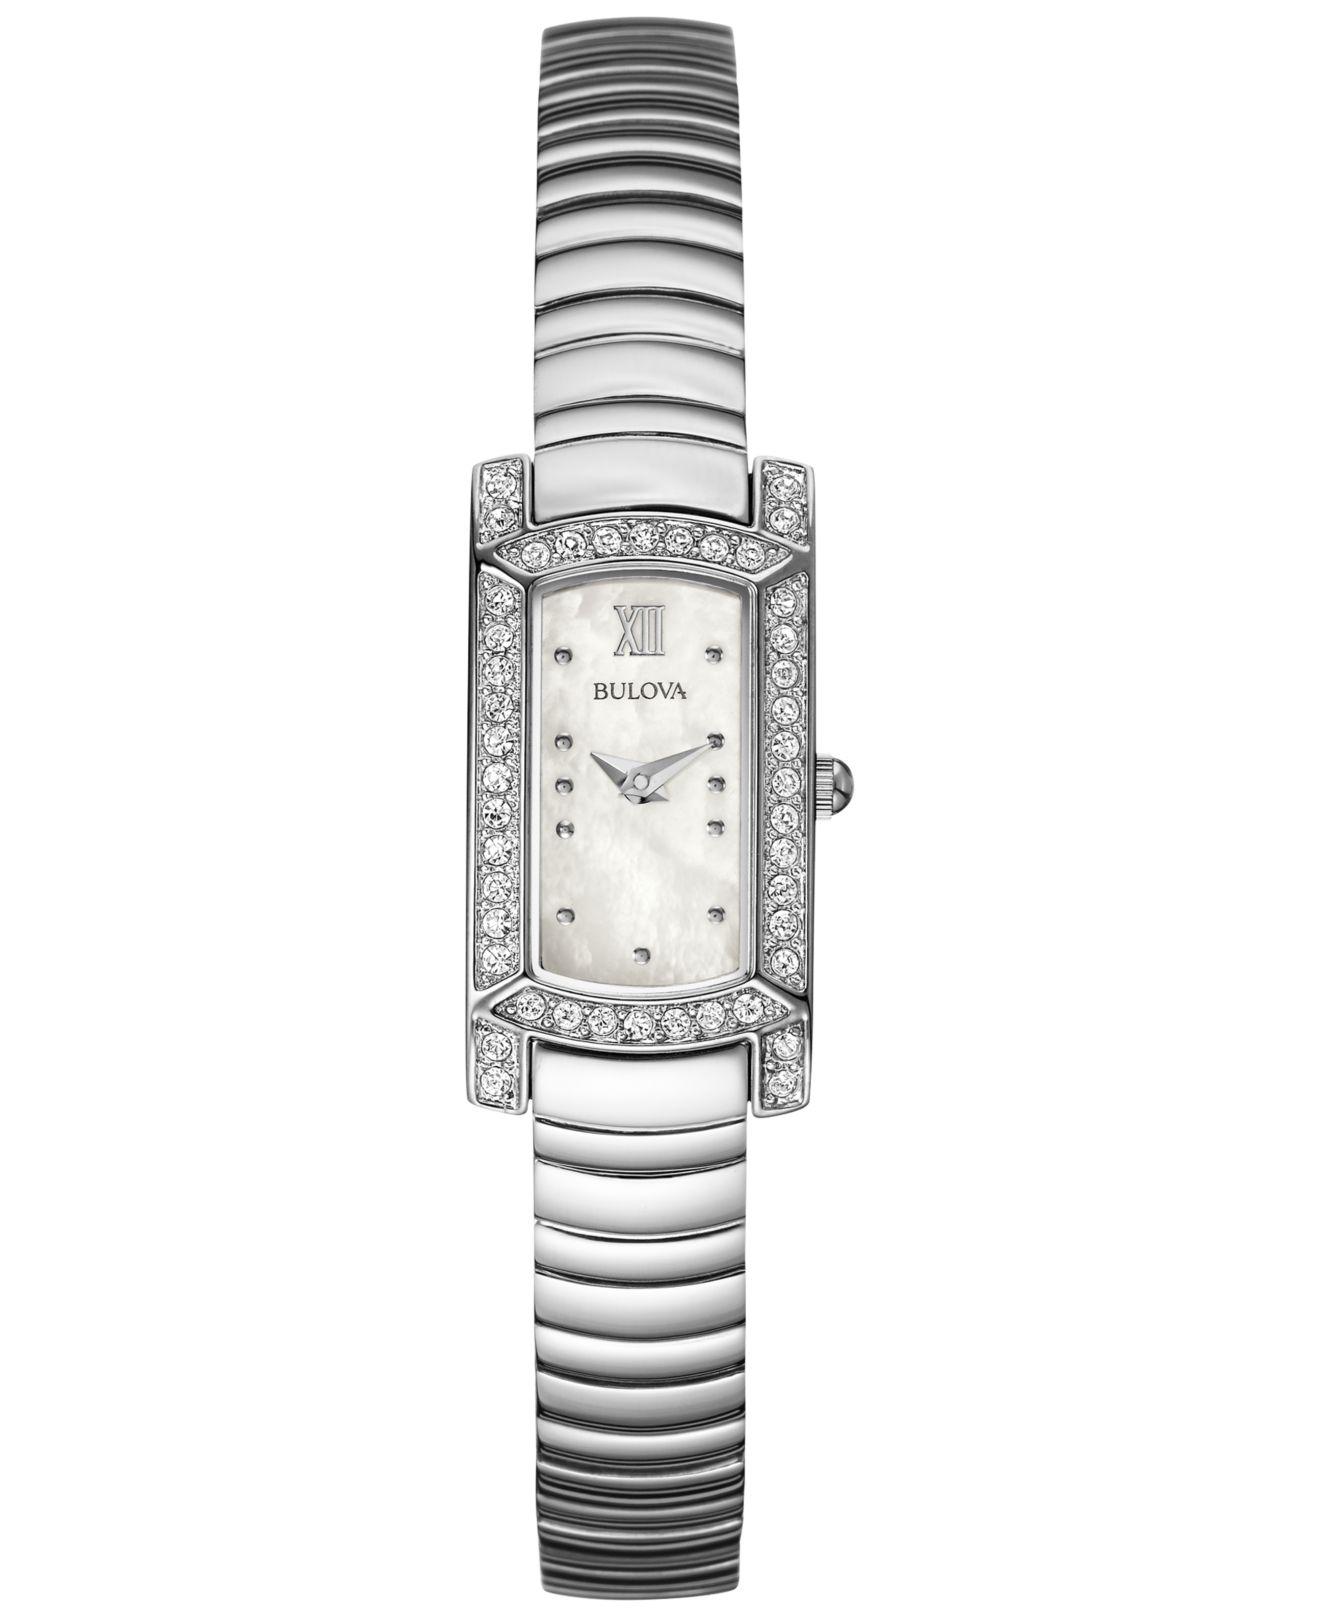 bulova s stainless steel bracelet 18x15mm